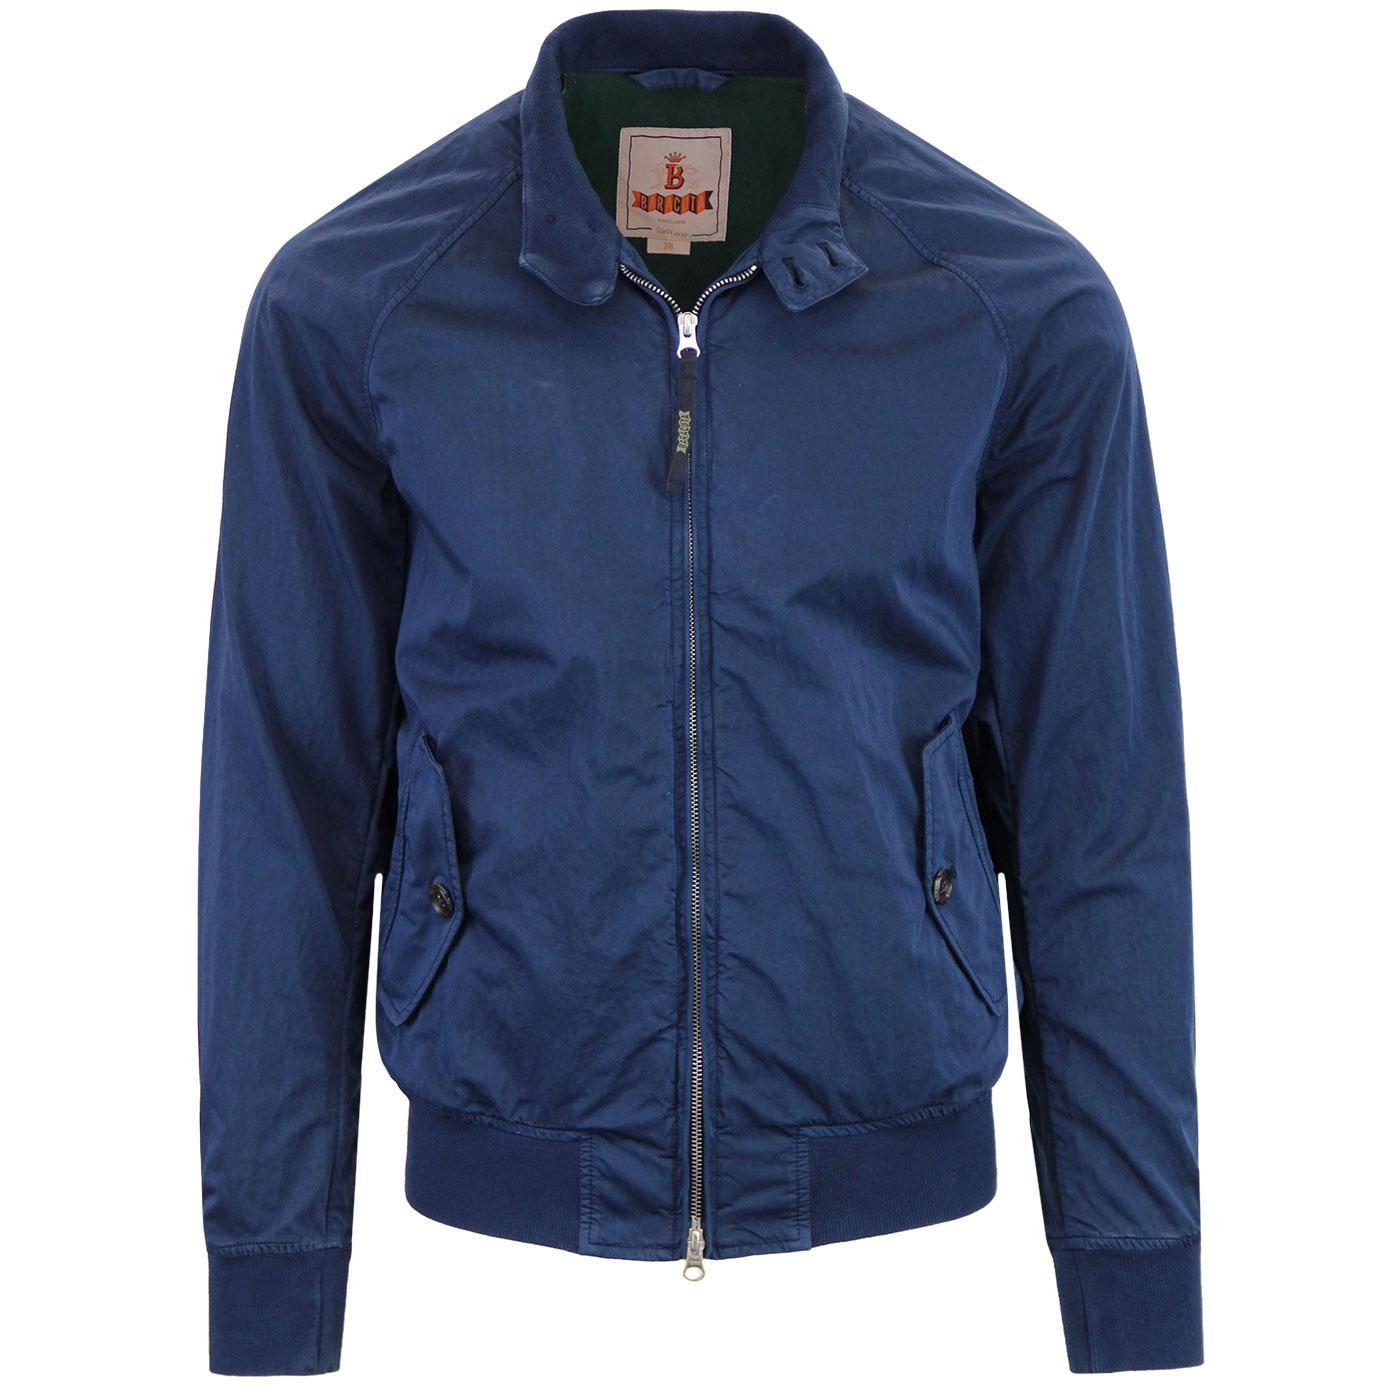 BARACUTA G9 Authentic Fit Sateen Harrington Jacket